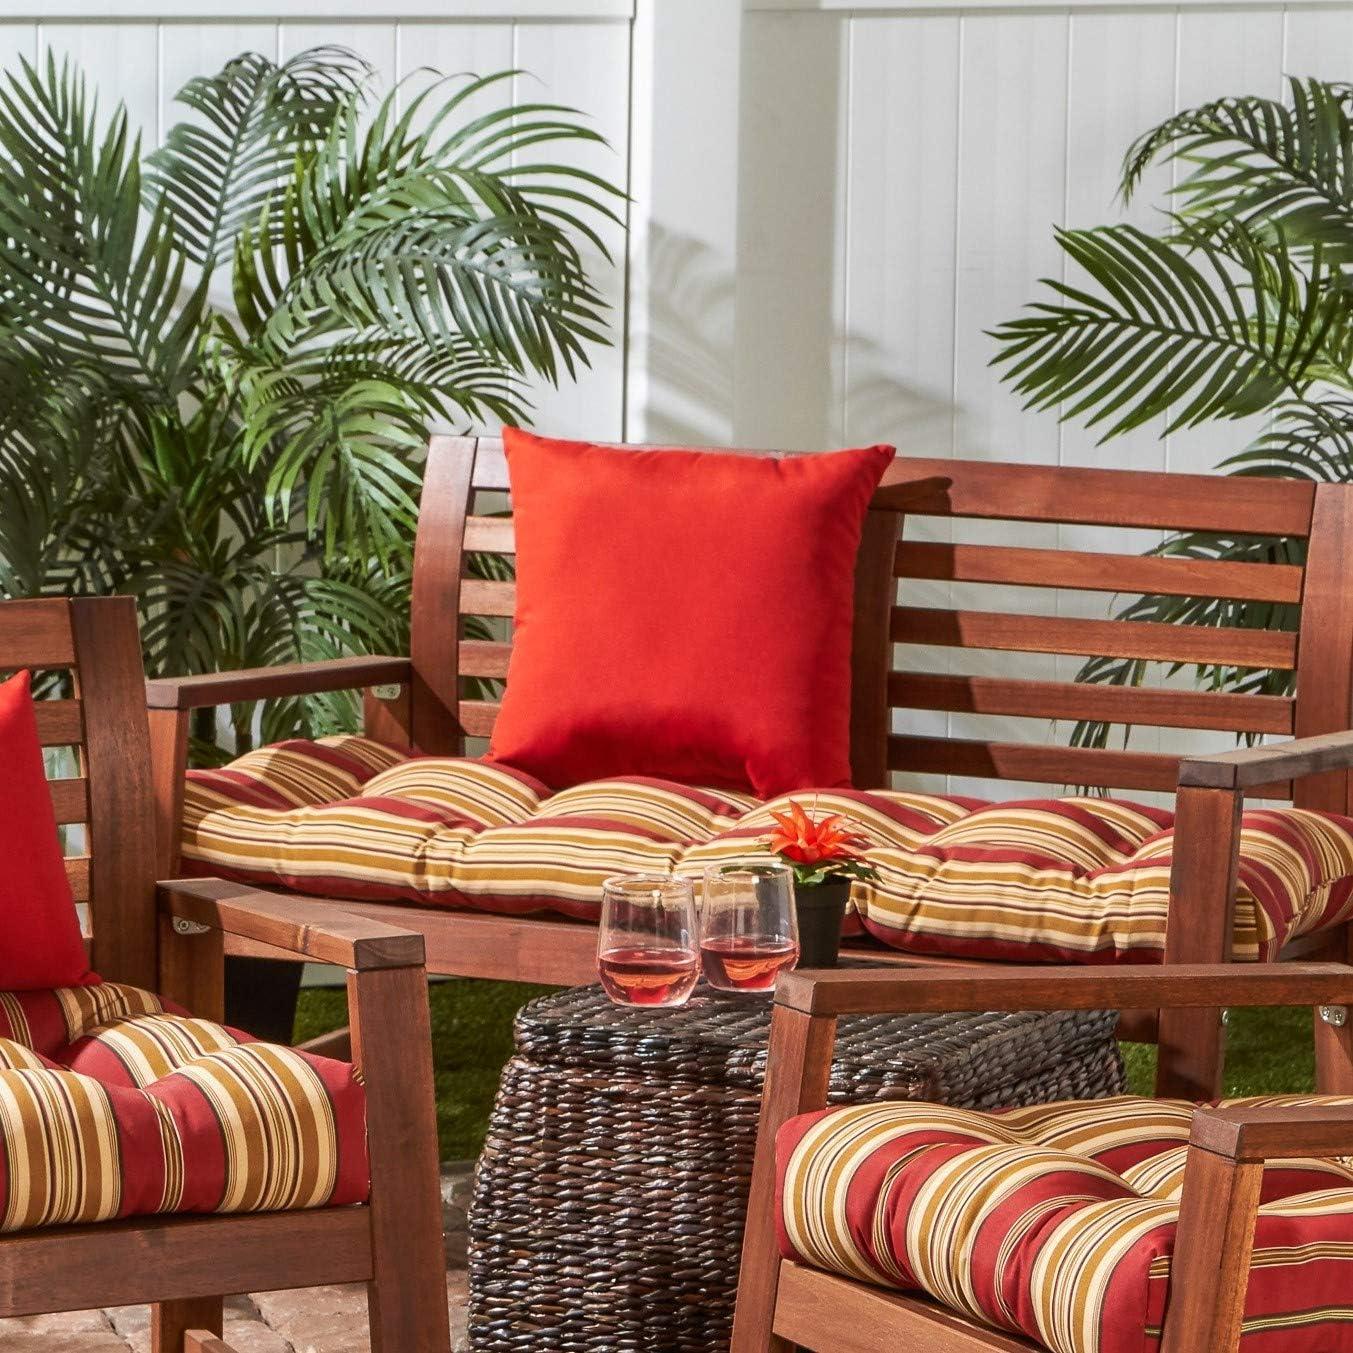 Amazon Com Greendale Home Fashions Indoor Outdoor Bench Cushion Roma Stripe 51 Inch Garden Outdoor